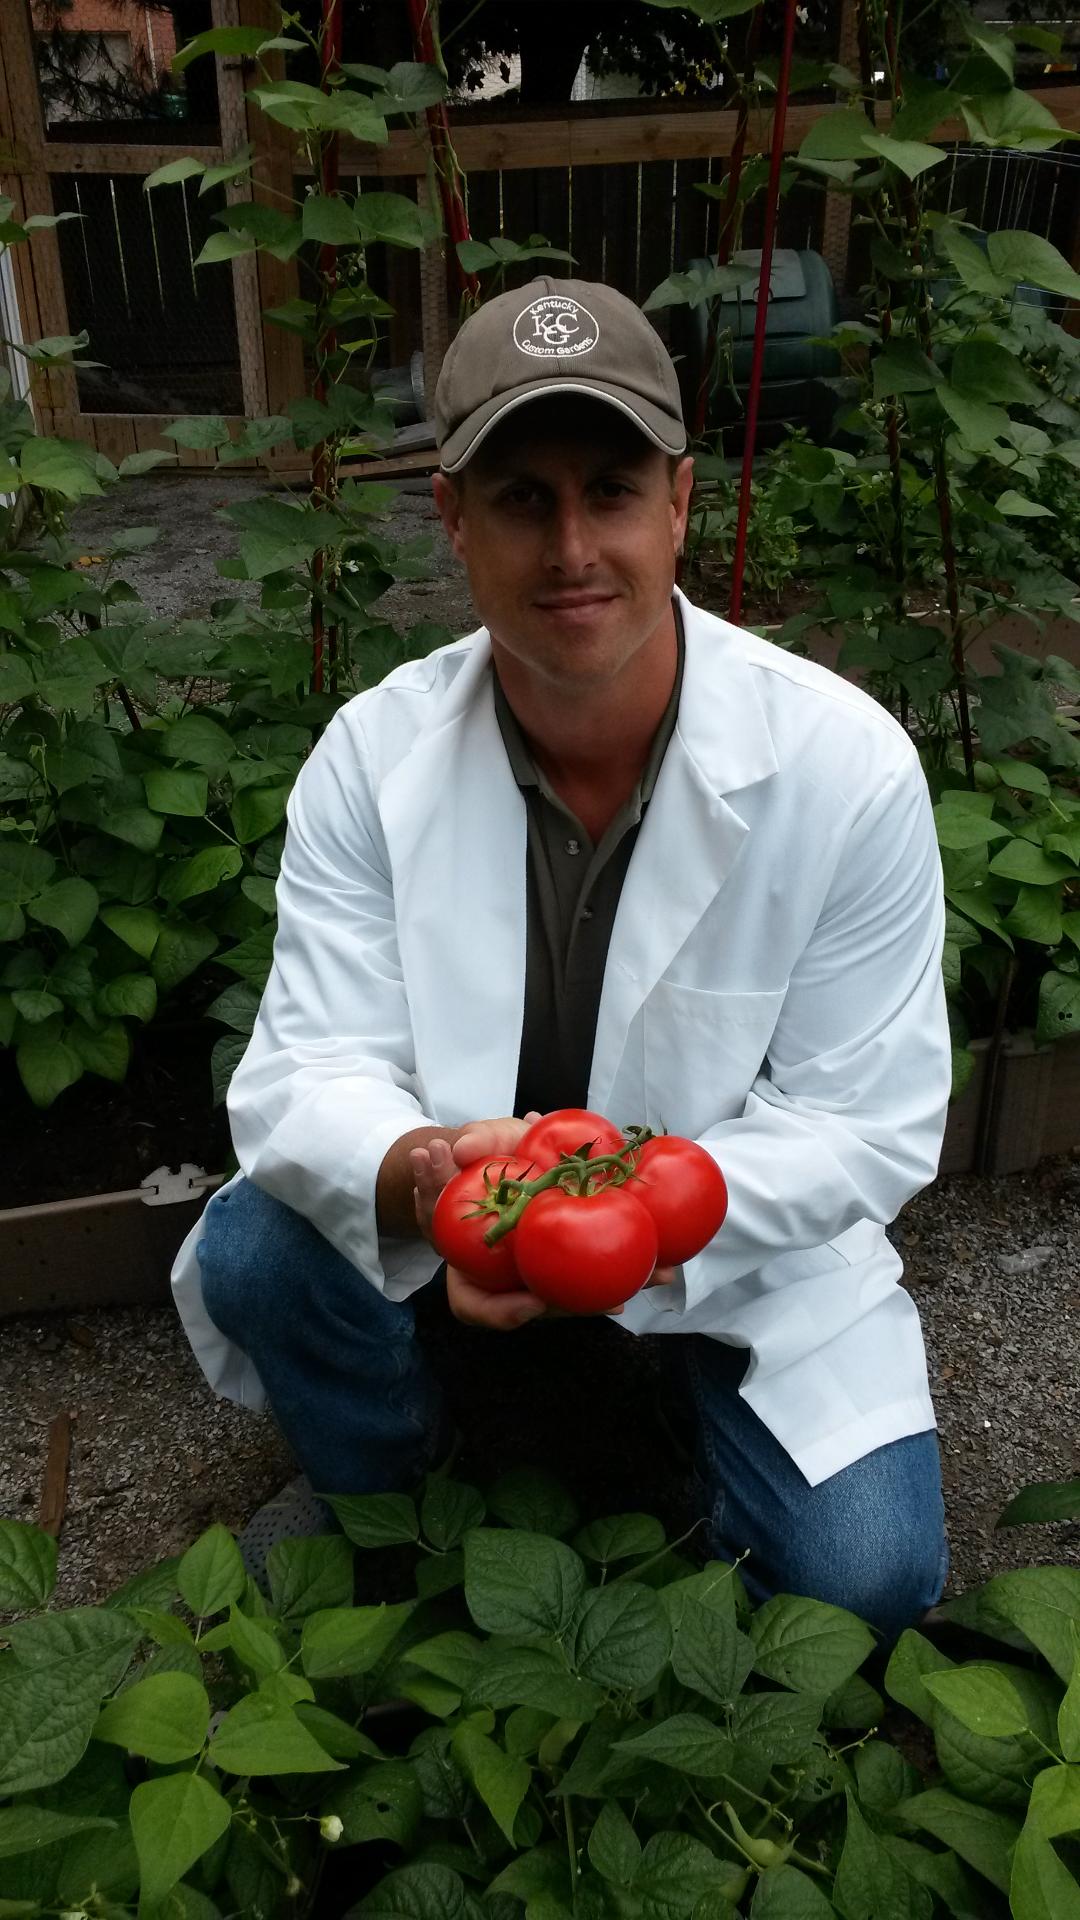 Brian Storz, PhD